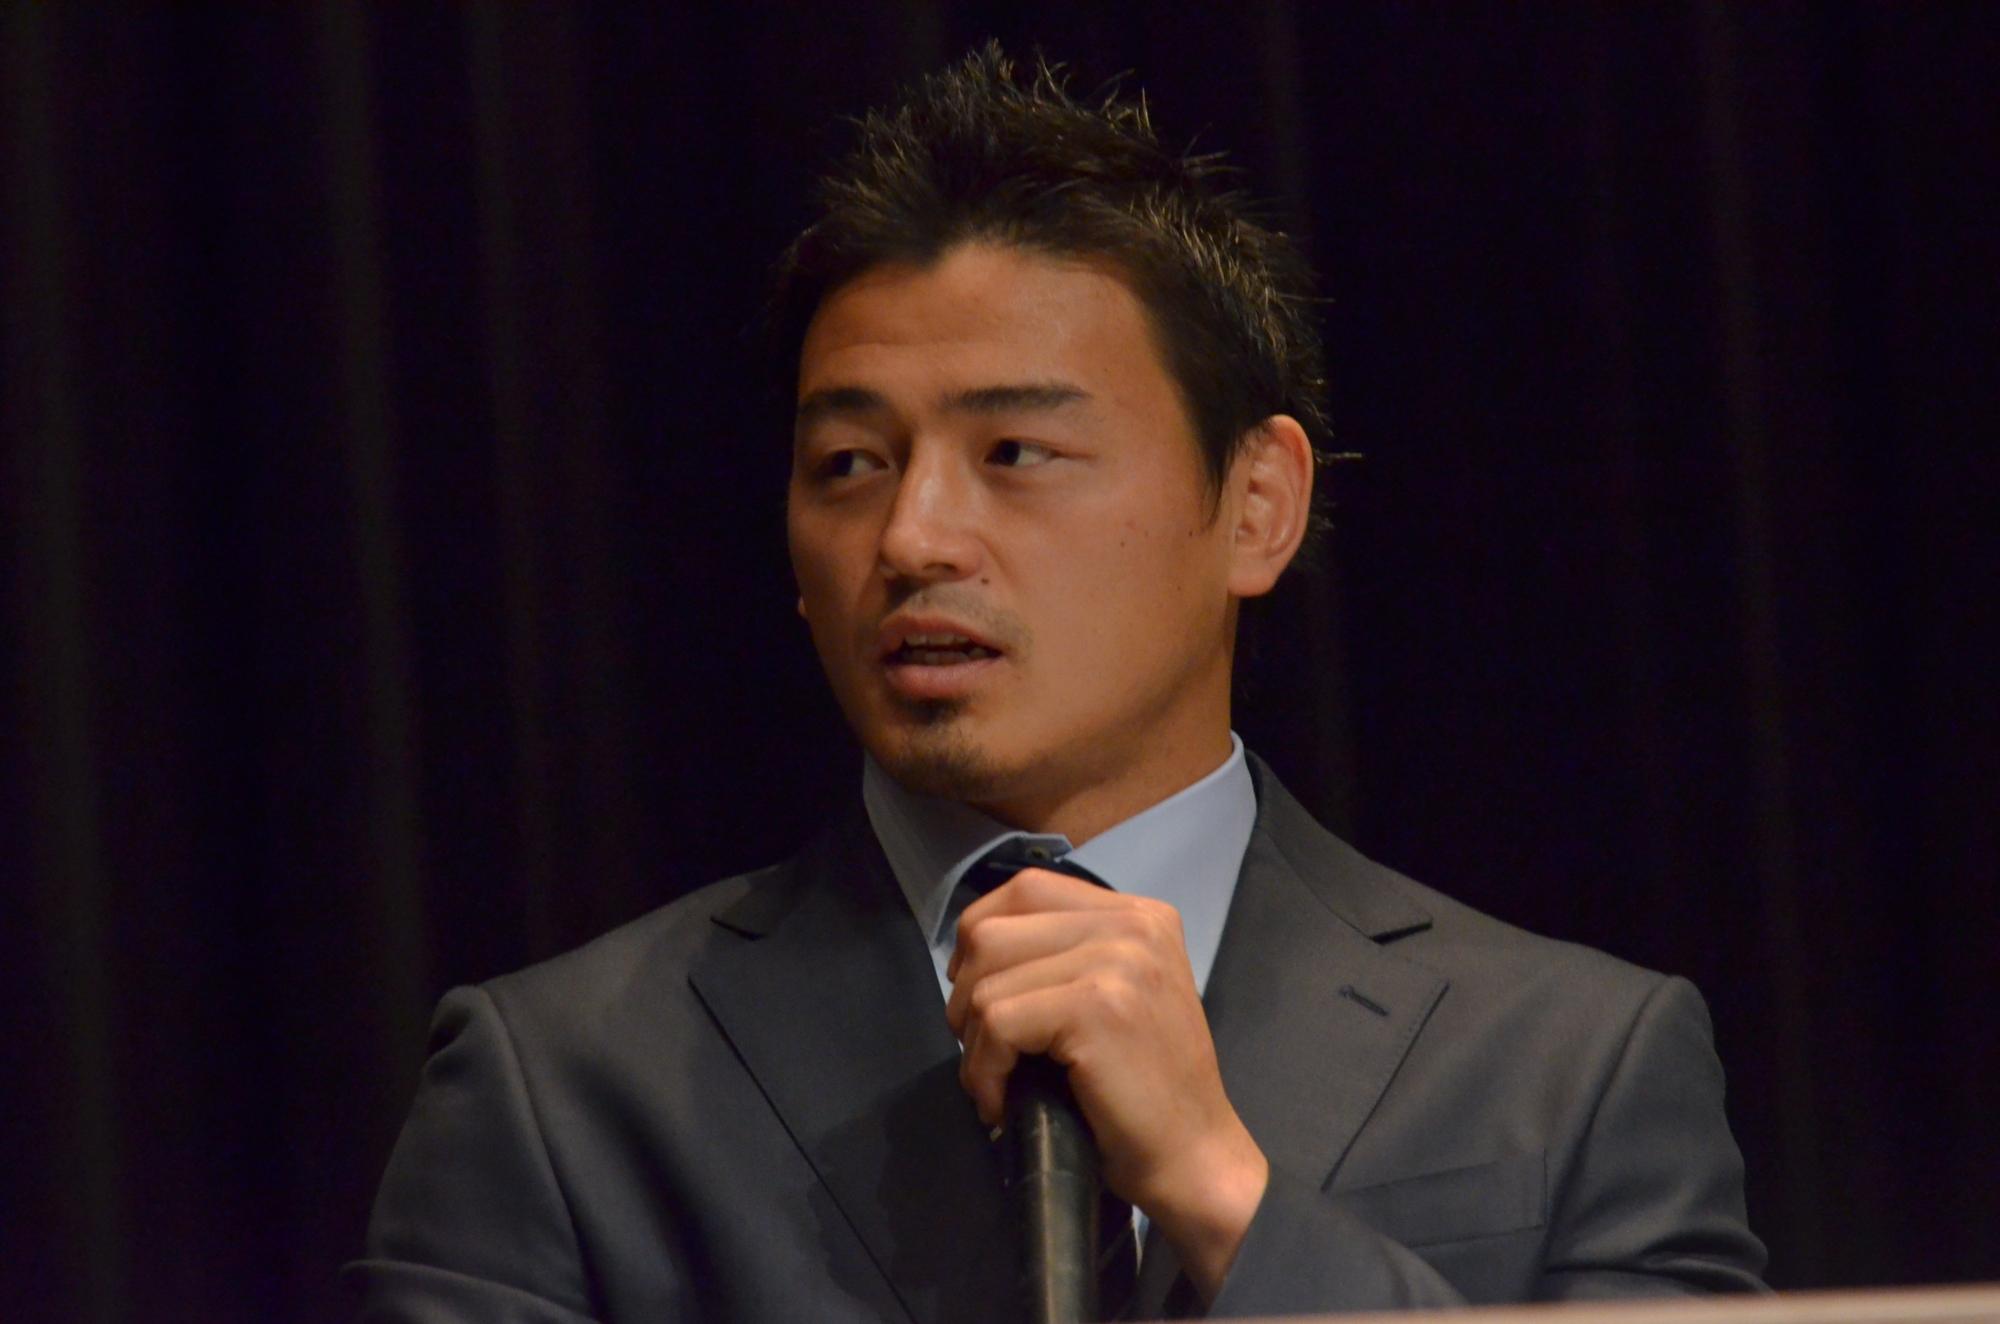 Asutralian Embassy releases a video message featuring rugby player Ayumu Goromaru